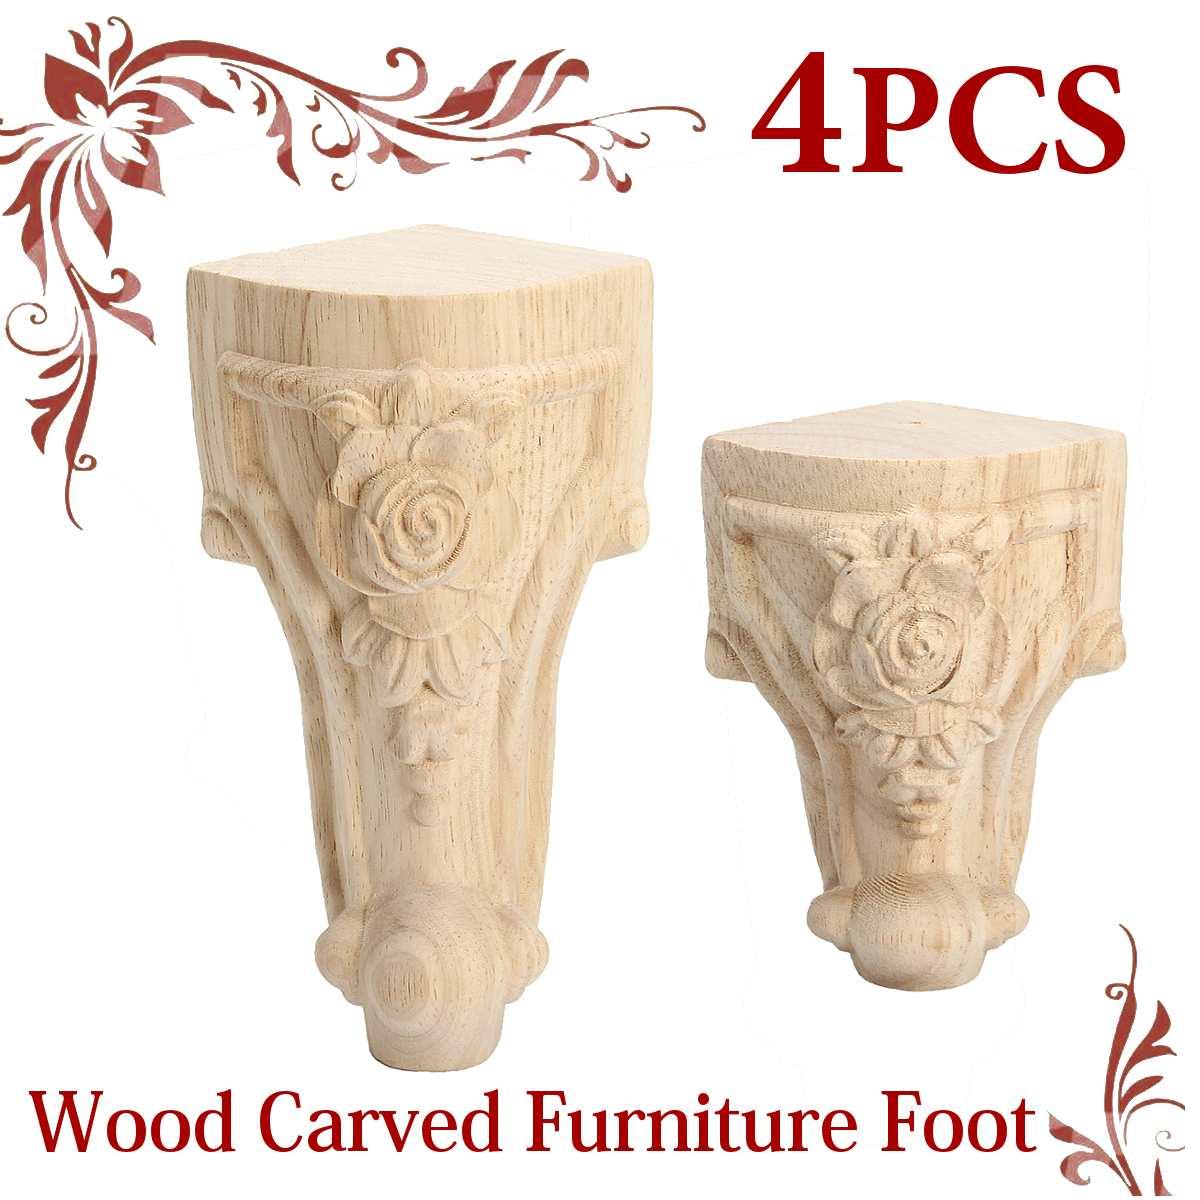 4Pcs/set 15x6cm/10x6cm European Furniture Foot Carved Wood TV Cabinet Seat Foot Bathroom Cabinet Legs4Pcs/set 15x6cm/10x6cm European Furniture Foot Carved Wood TV Cabinet Seat Foot Bathroom Cabinet Legs